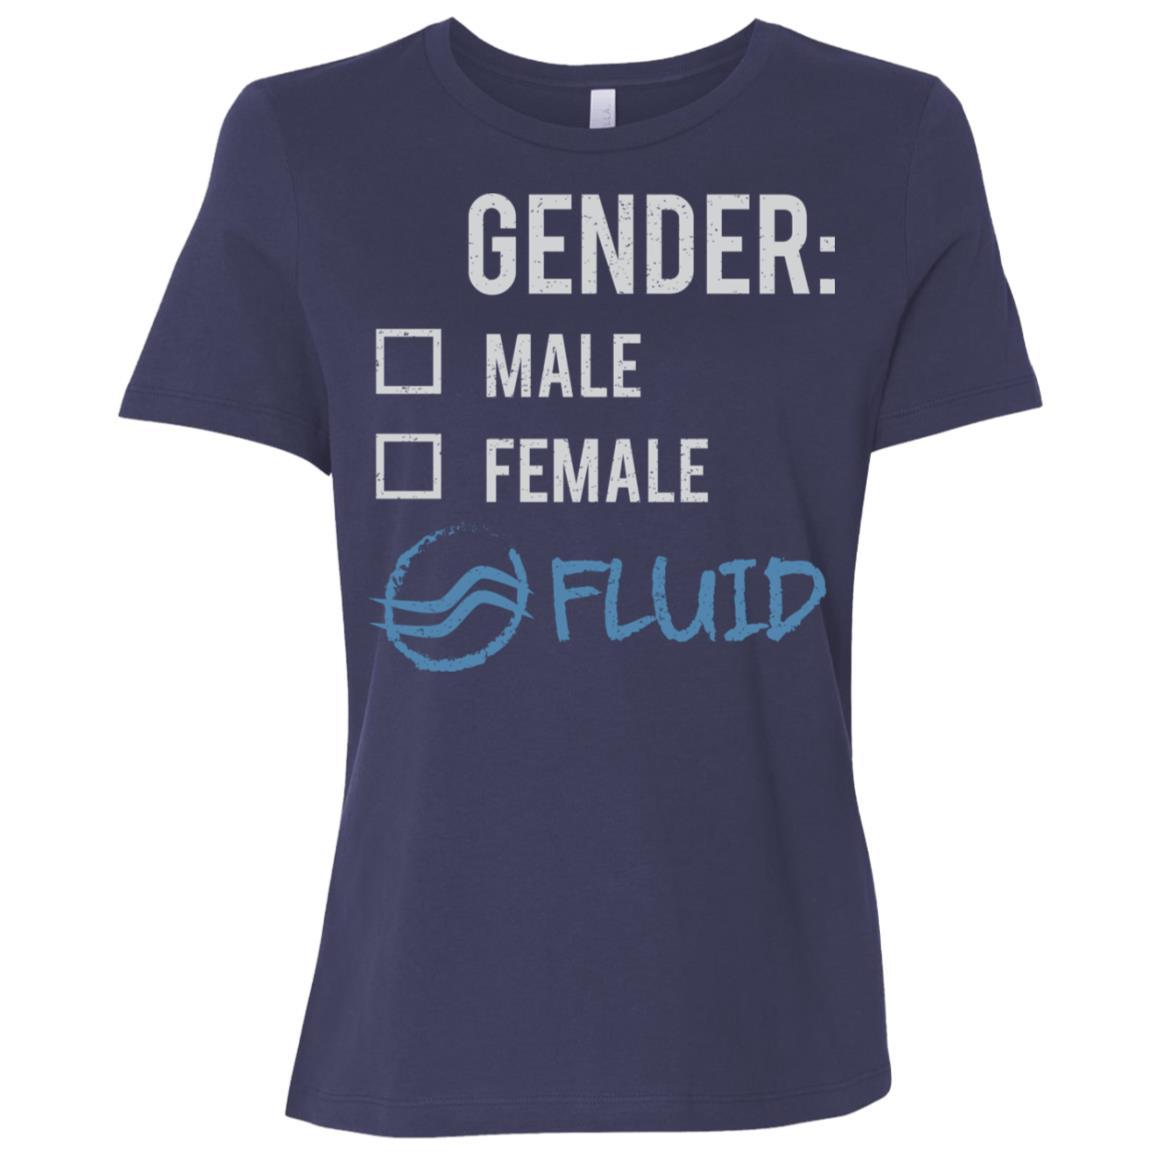 Male Female Fluid Gender Nonbinary Trans Women Short Sleeve T-Shirt